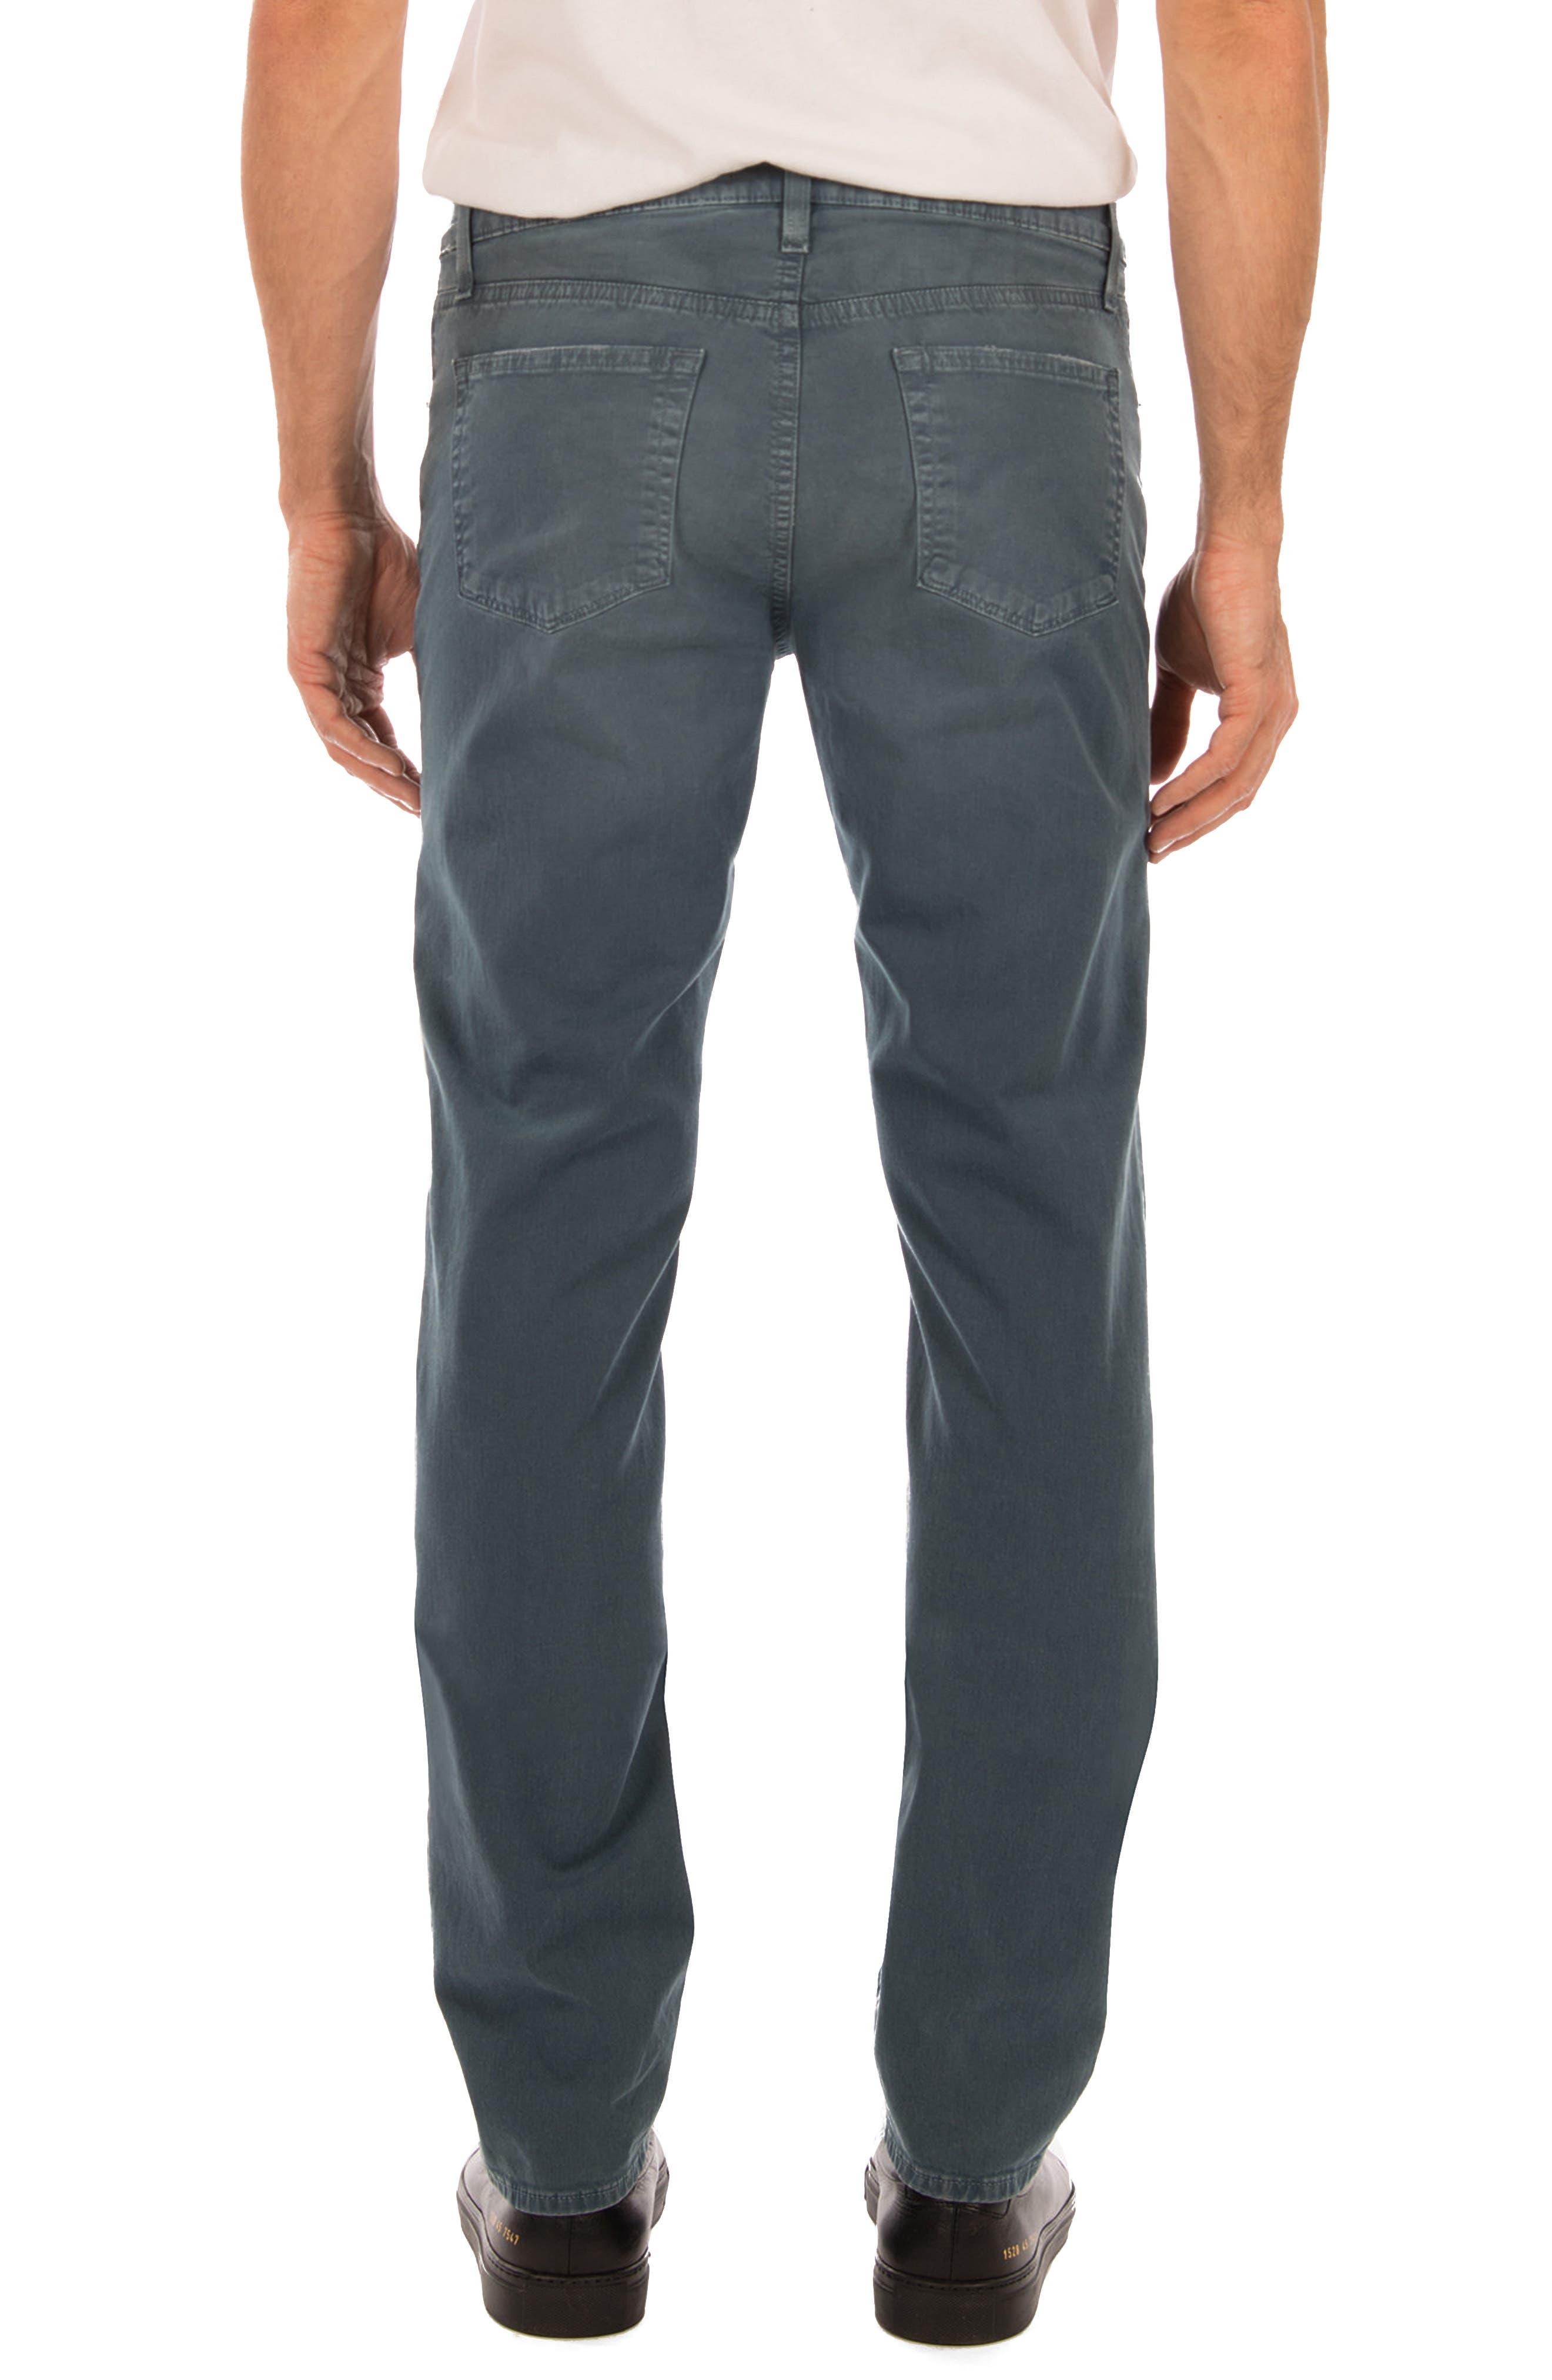 Tyler Slim Fit Jeans,                             Alternate thumbnail 3, color,                             Thrashed Tilite